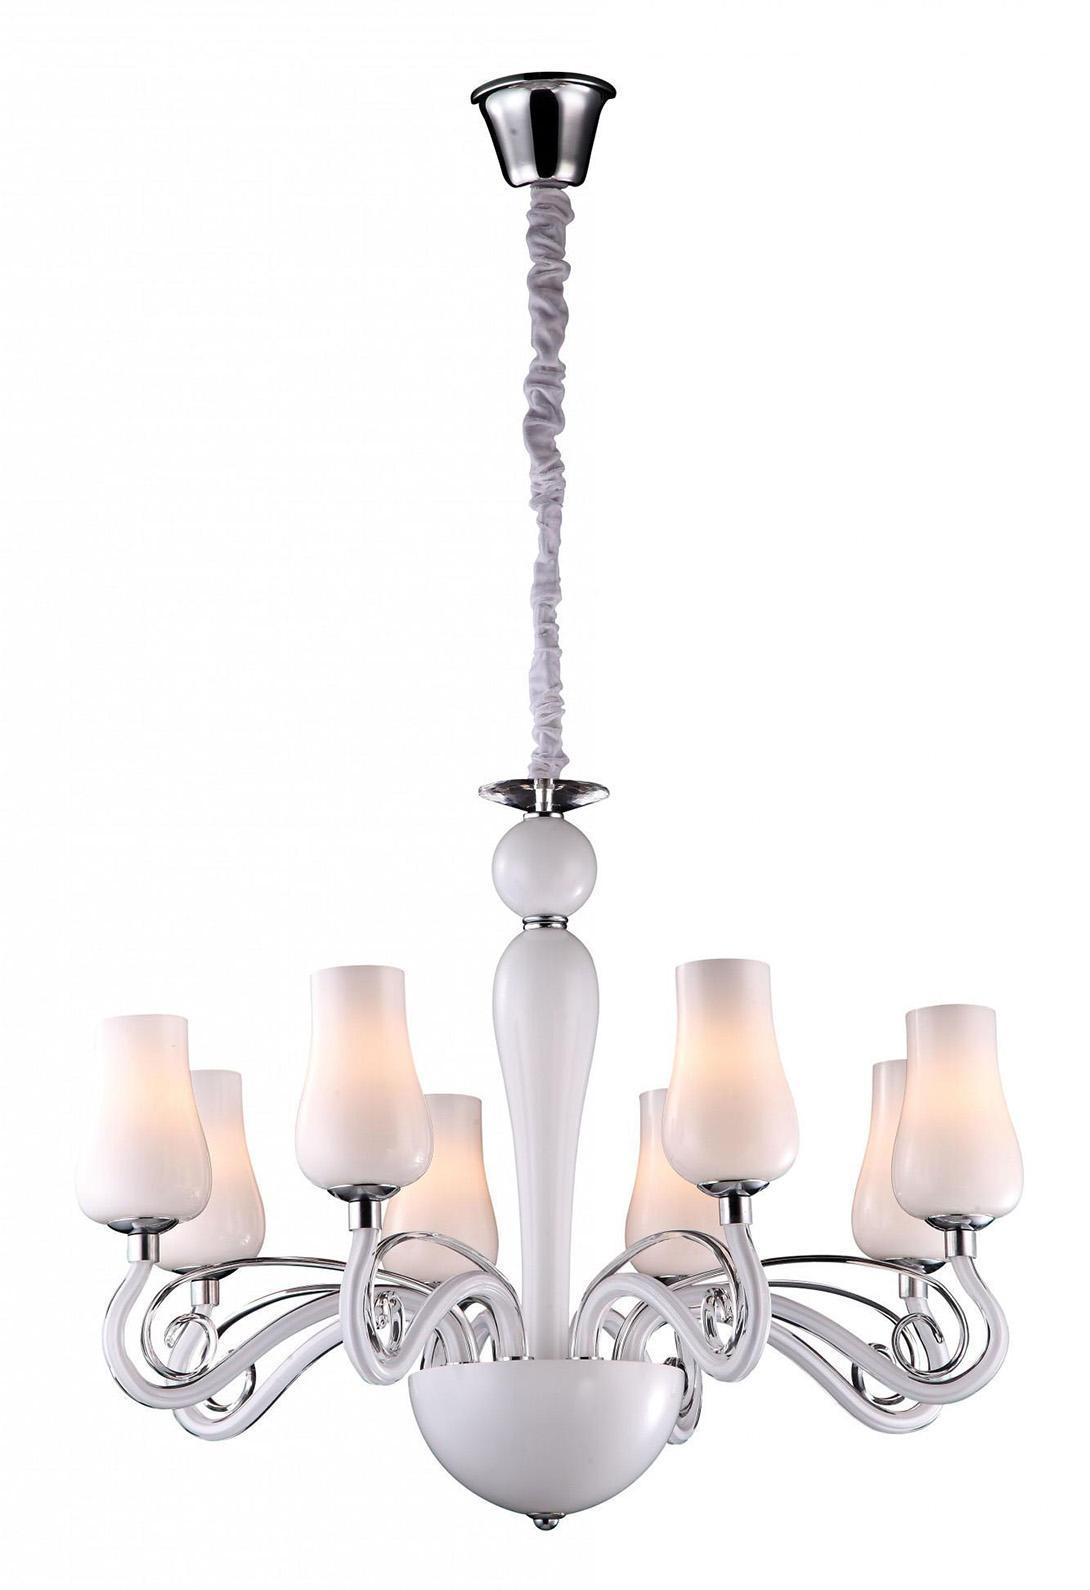 A8110LM-8WH BIANCANEVE Люстра на цепи подвесная люстра arte lamp biancaneve a8110lm 8wh